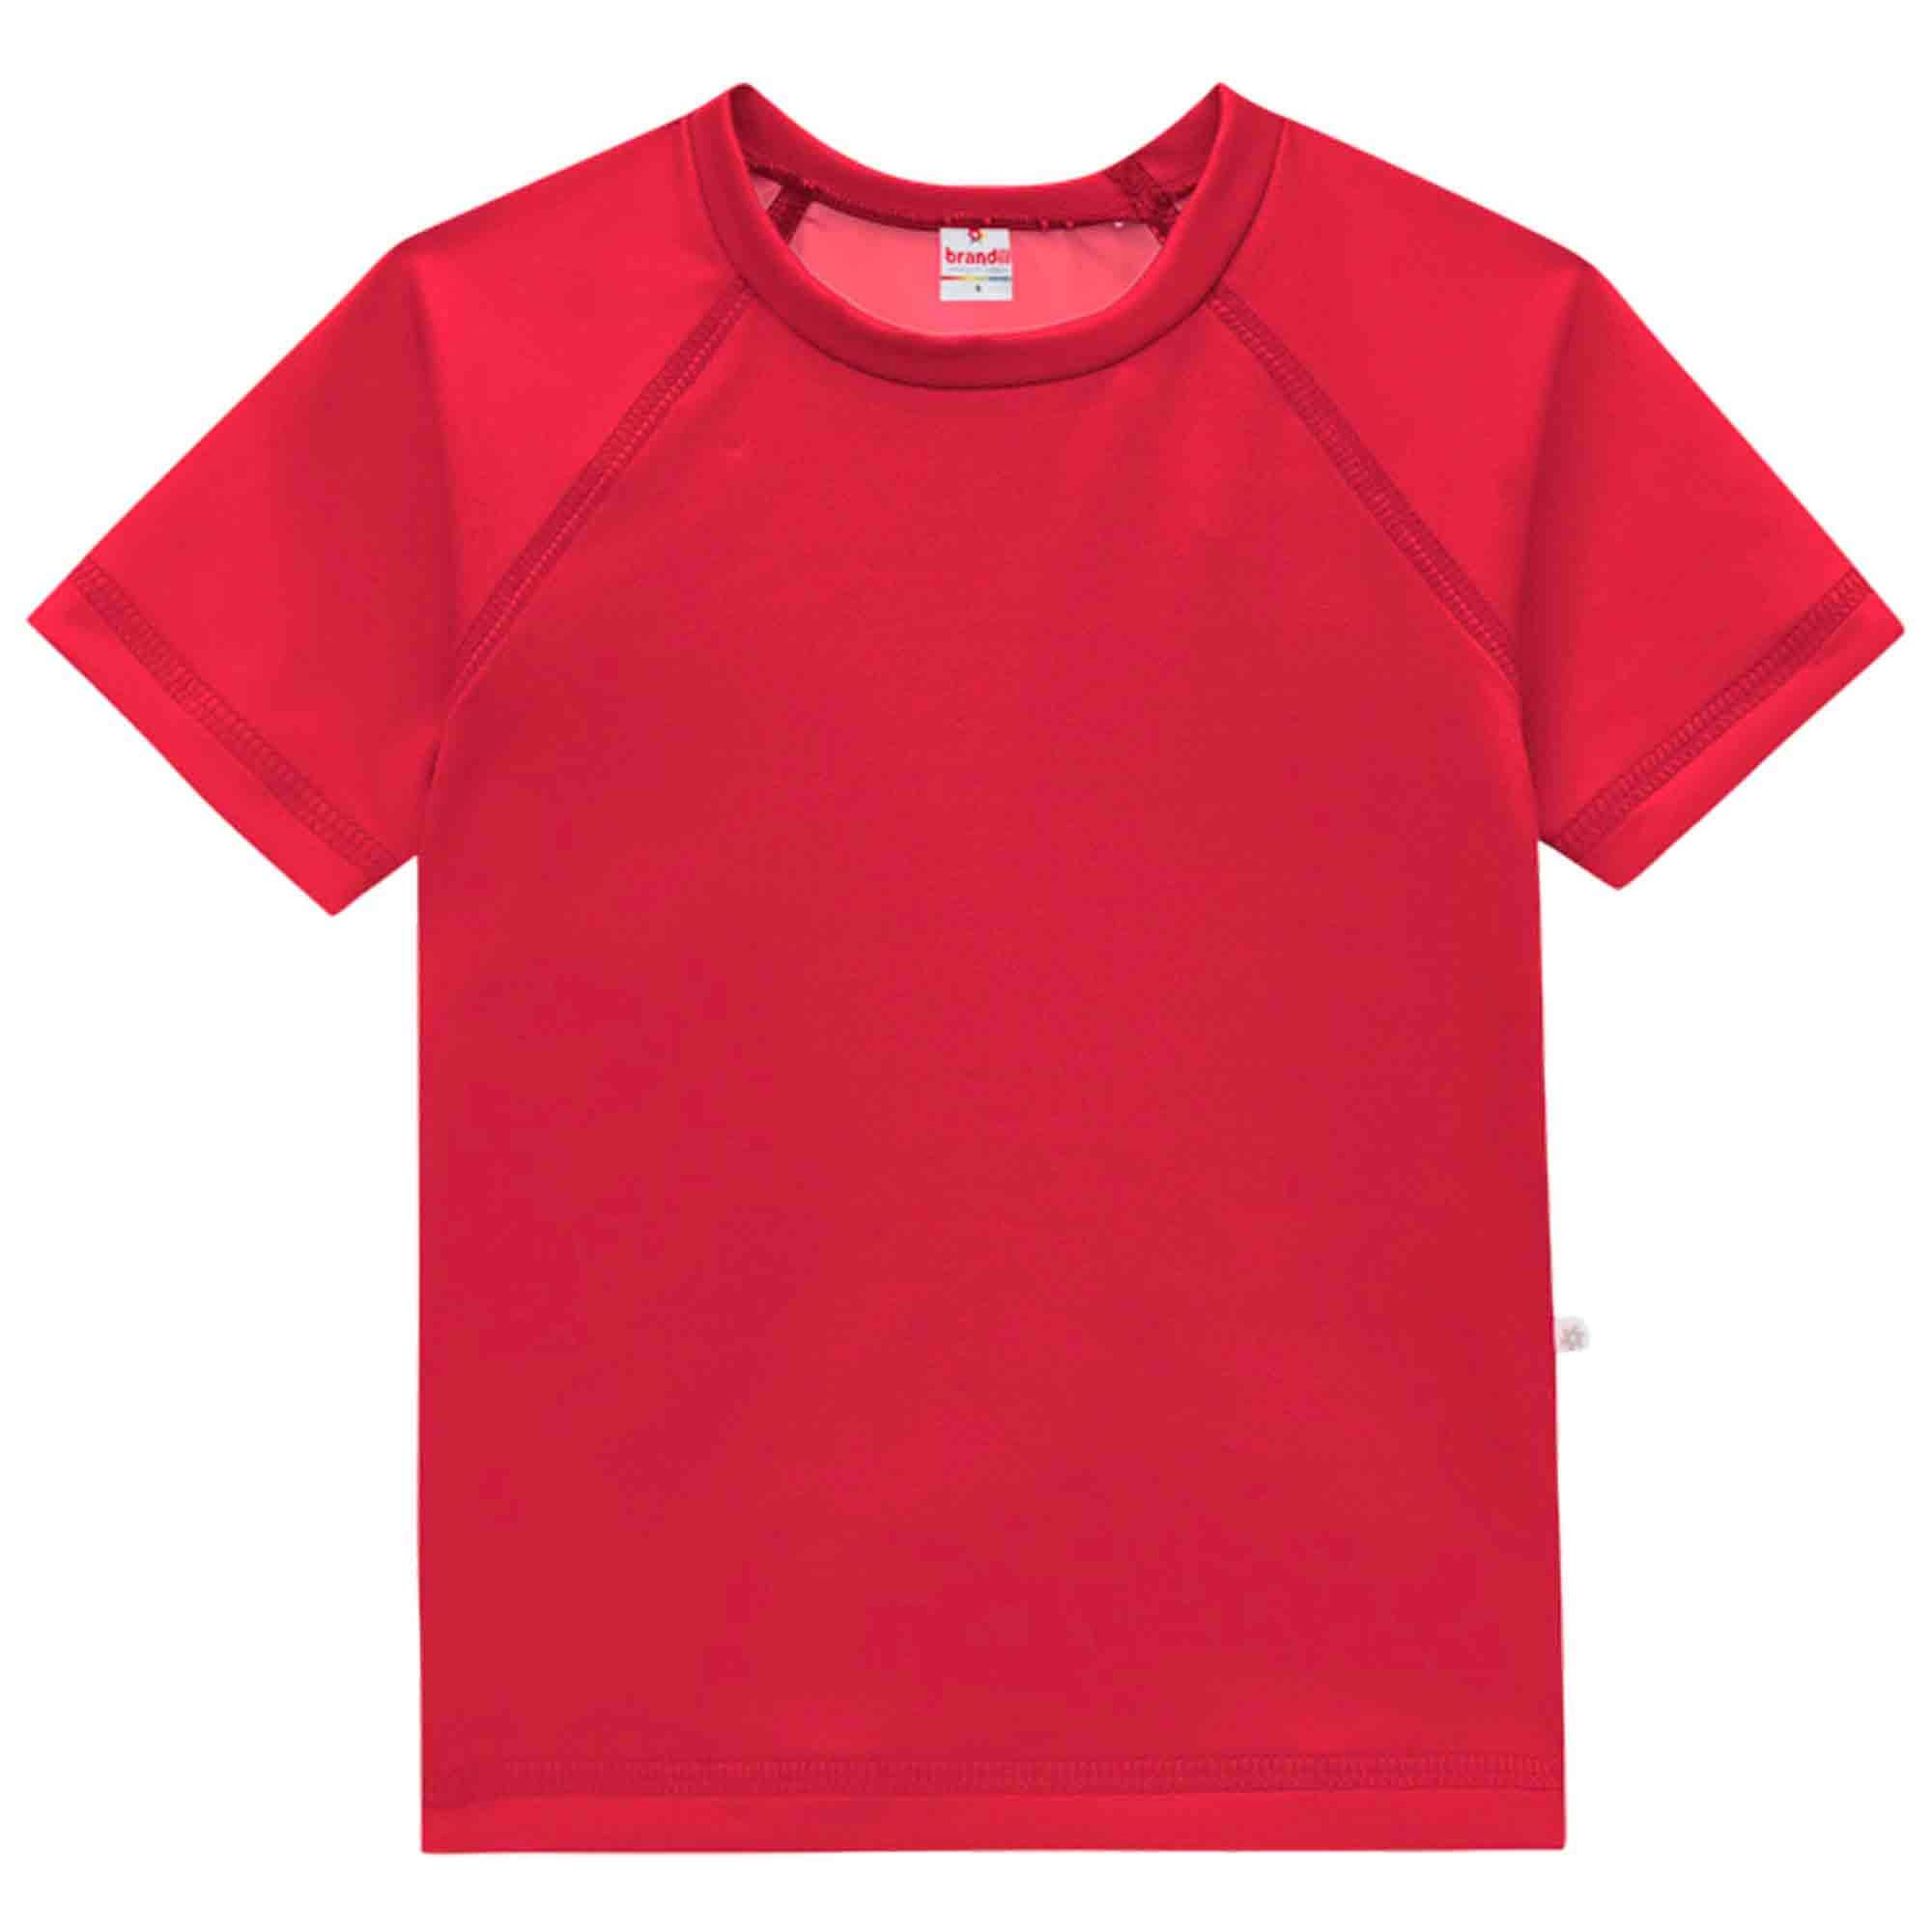 Camiseta Meia Manga Brandili - Malha UV - 1 ao 3